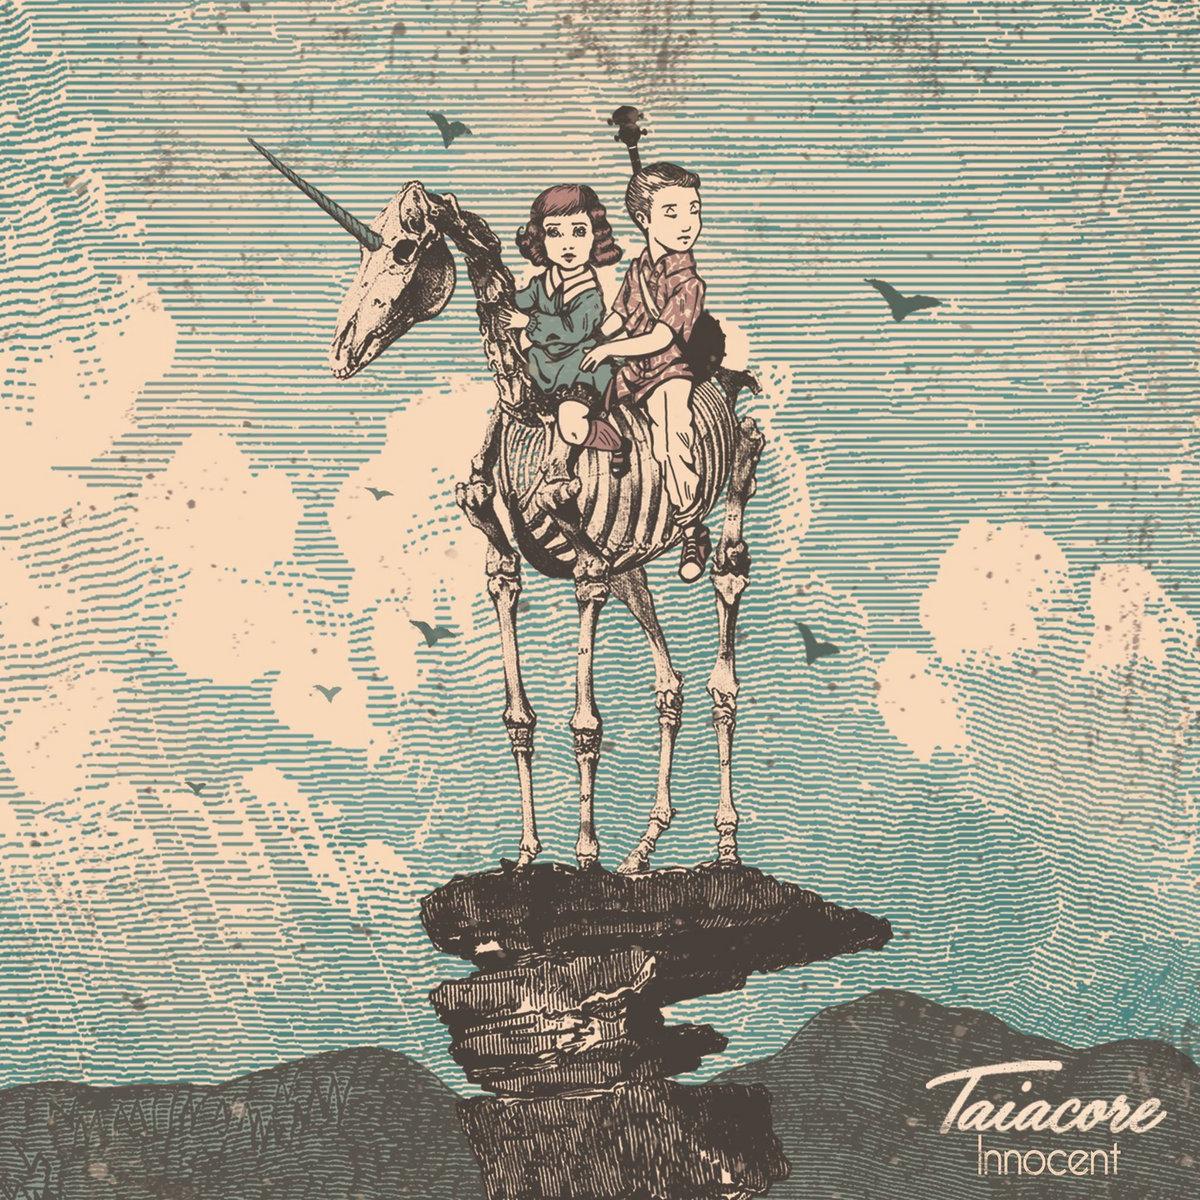 Taiacore - Innocent